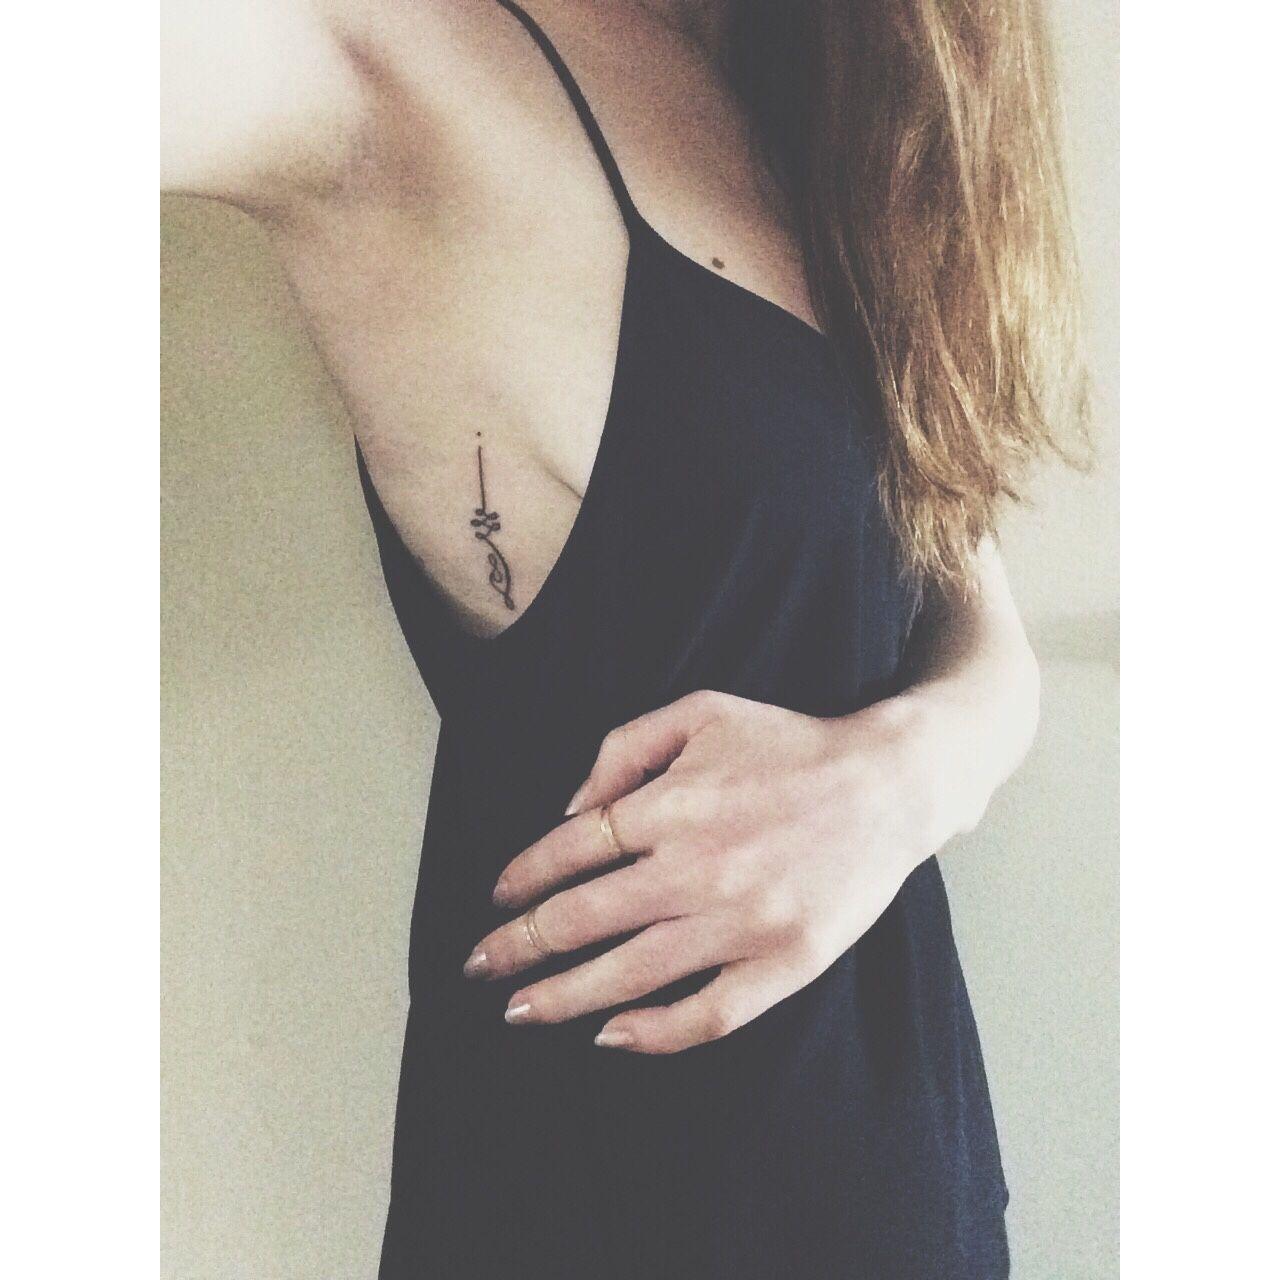 Gerelateerde afbeelding Small tattoos, Cool small